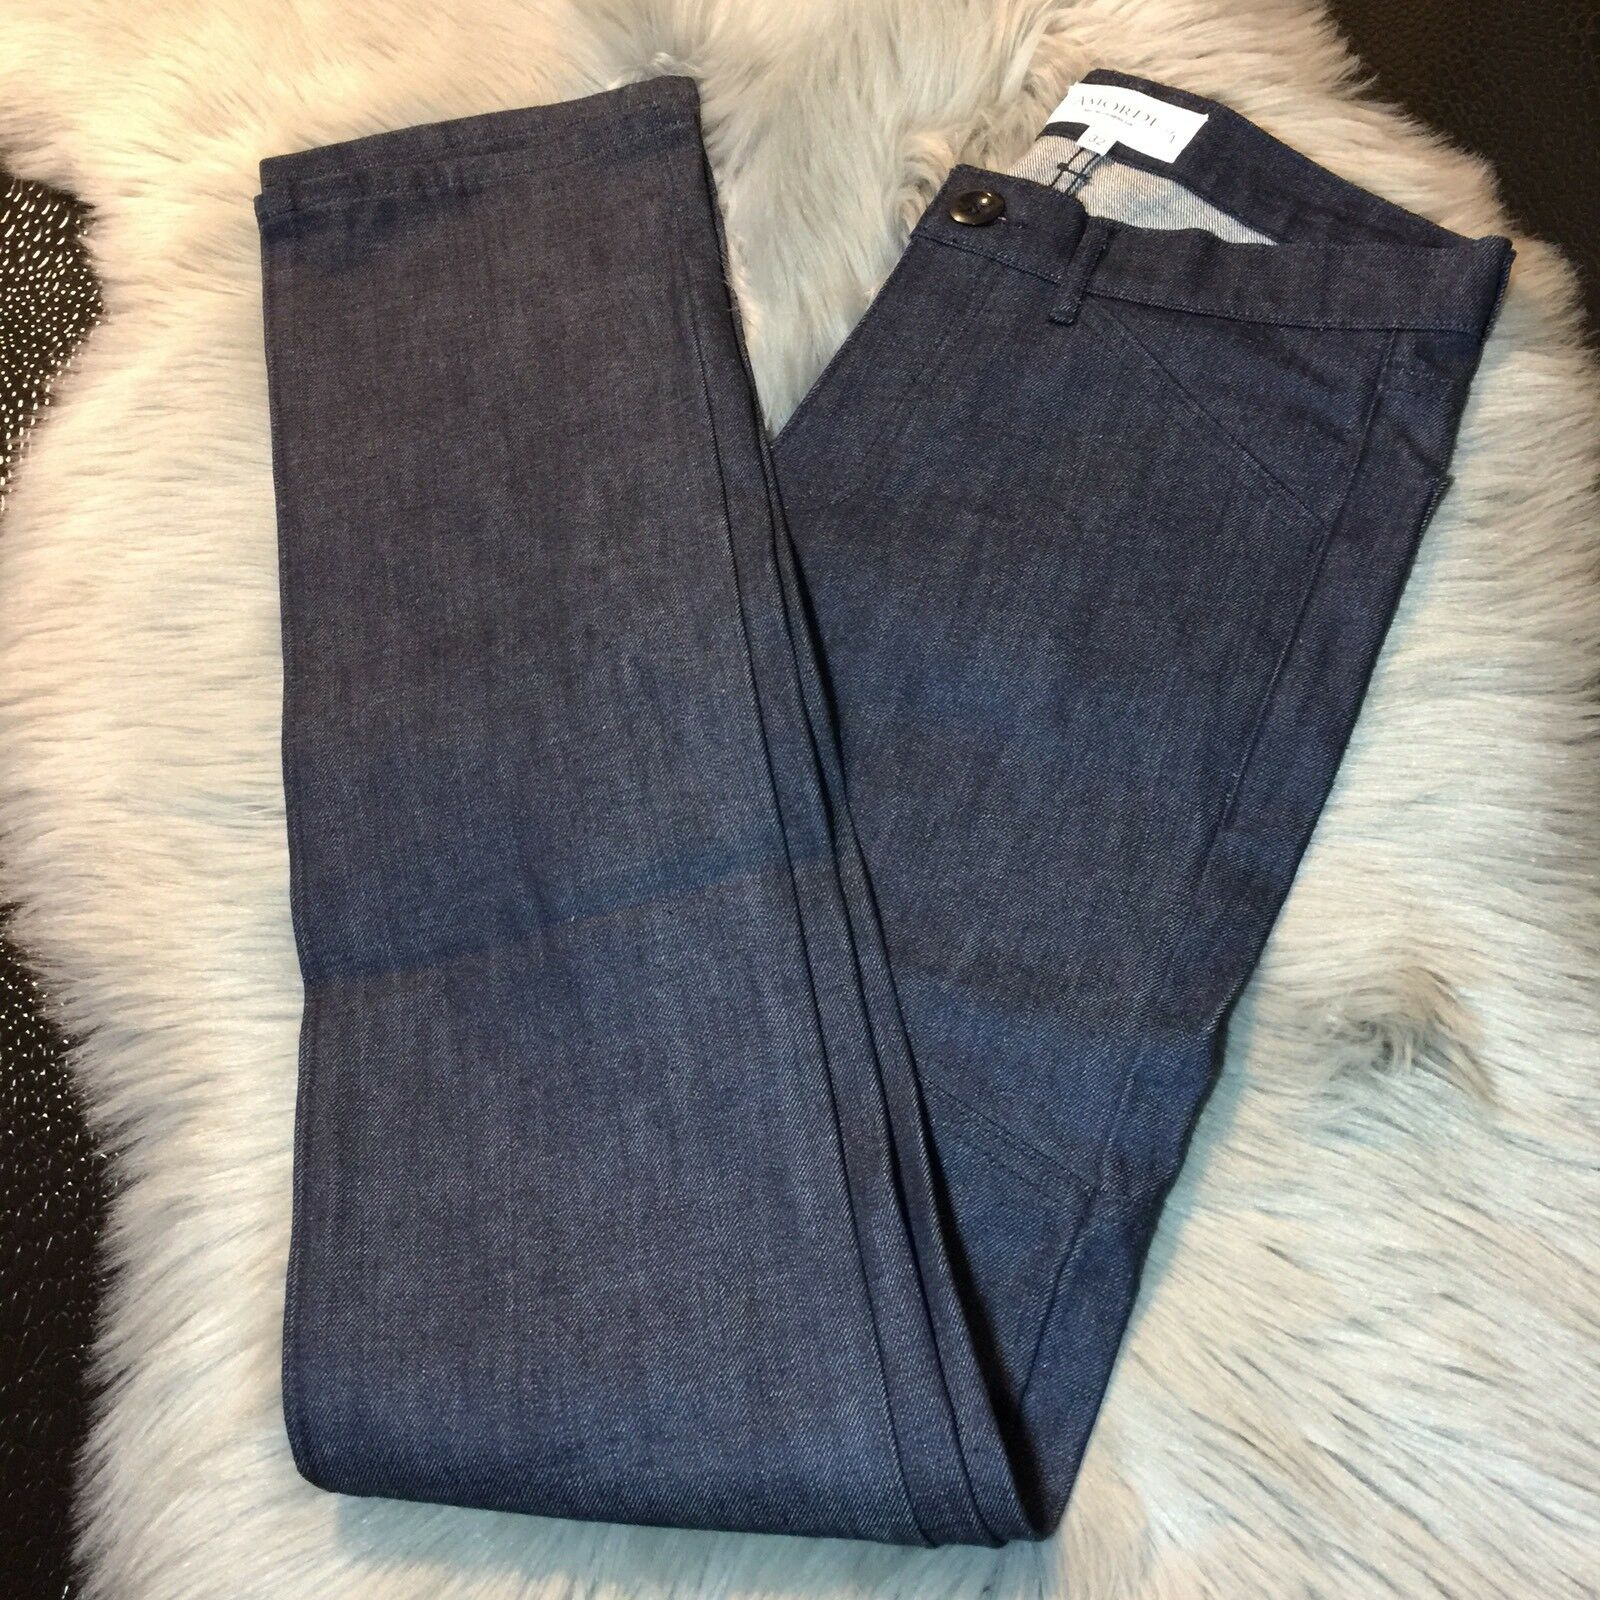 NWOT AmorDe San Francisco Ca Dark Wash Organic Jeans Sz 32 Waist Long